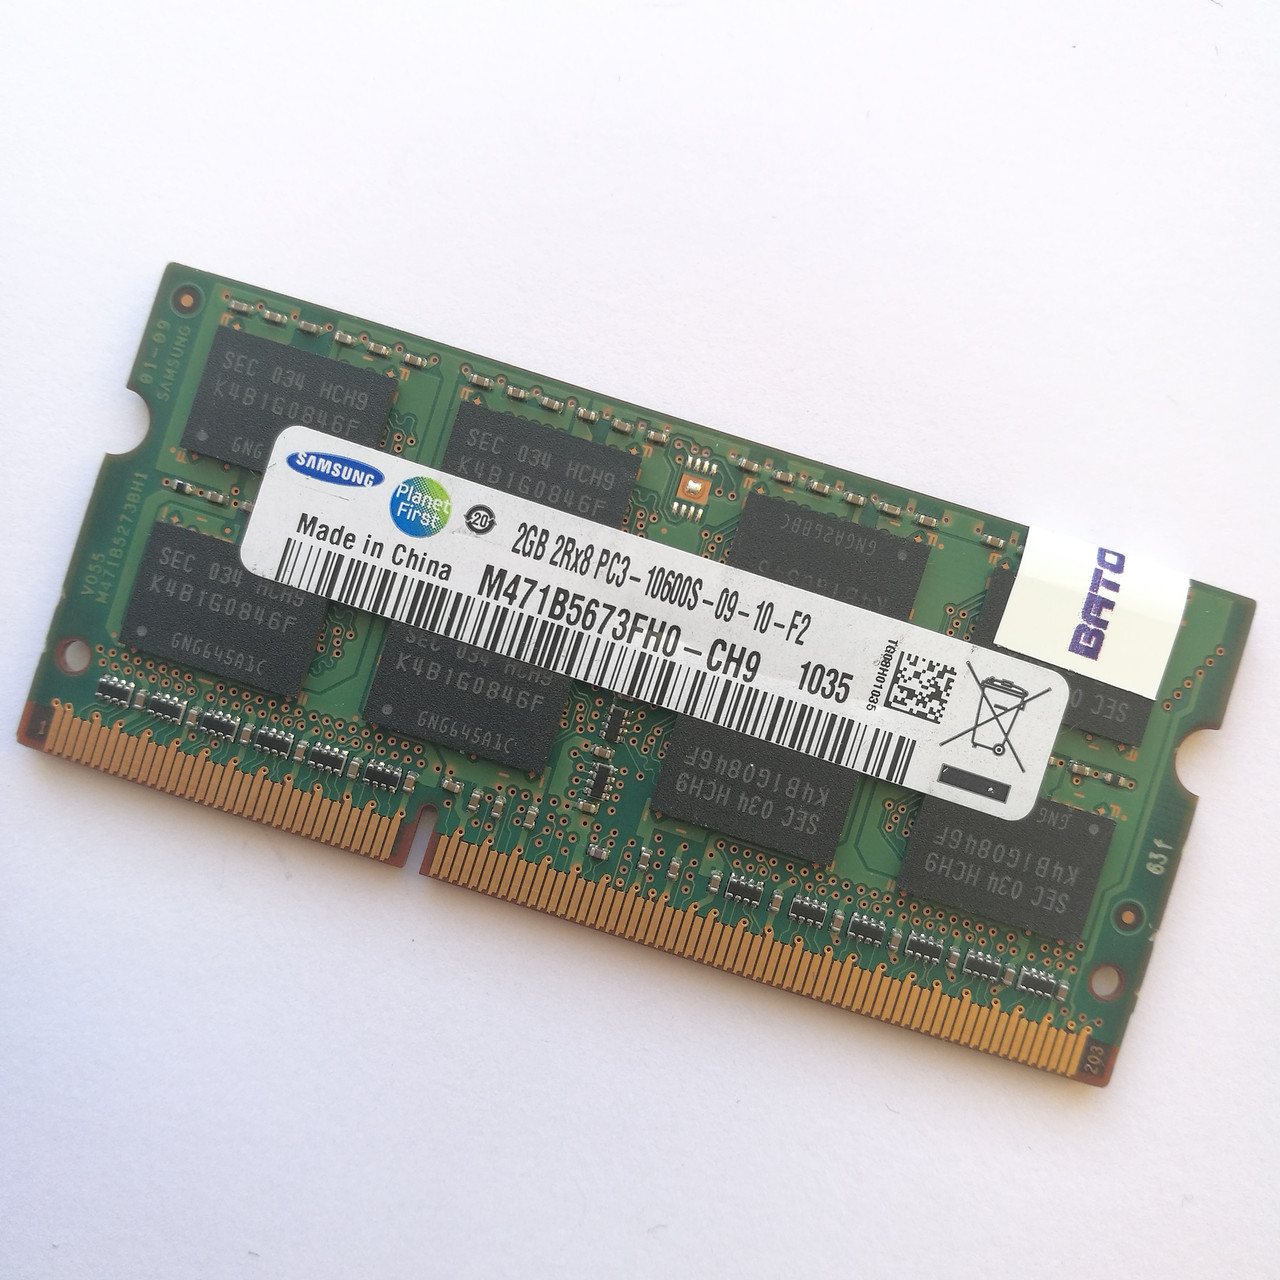 Оперативная память для ноутбука Samsung SODIMM DDR3 2Gb 1333MHz 10600s CL9 (M471B5673FH0-CH9) Б/У